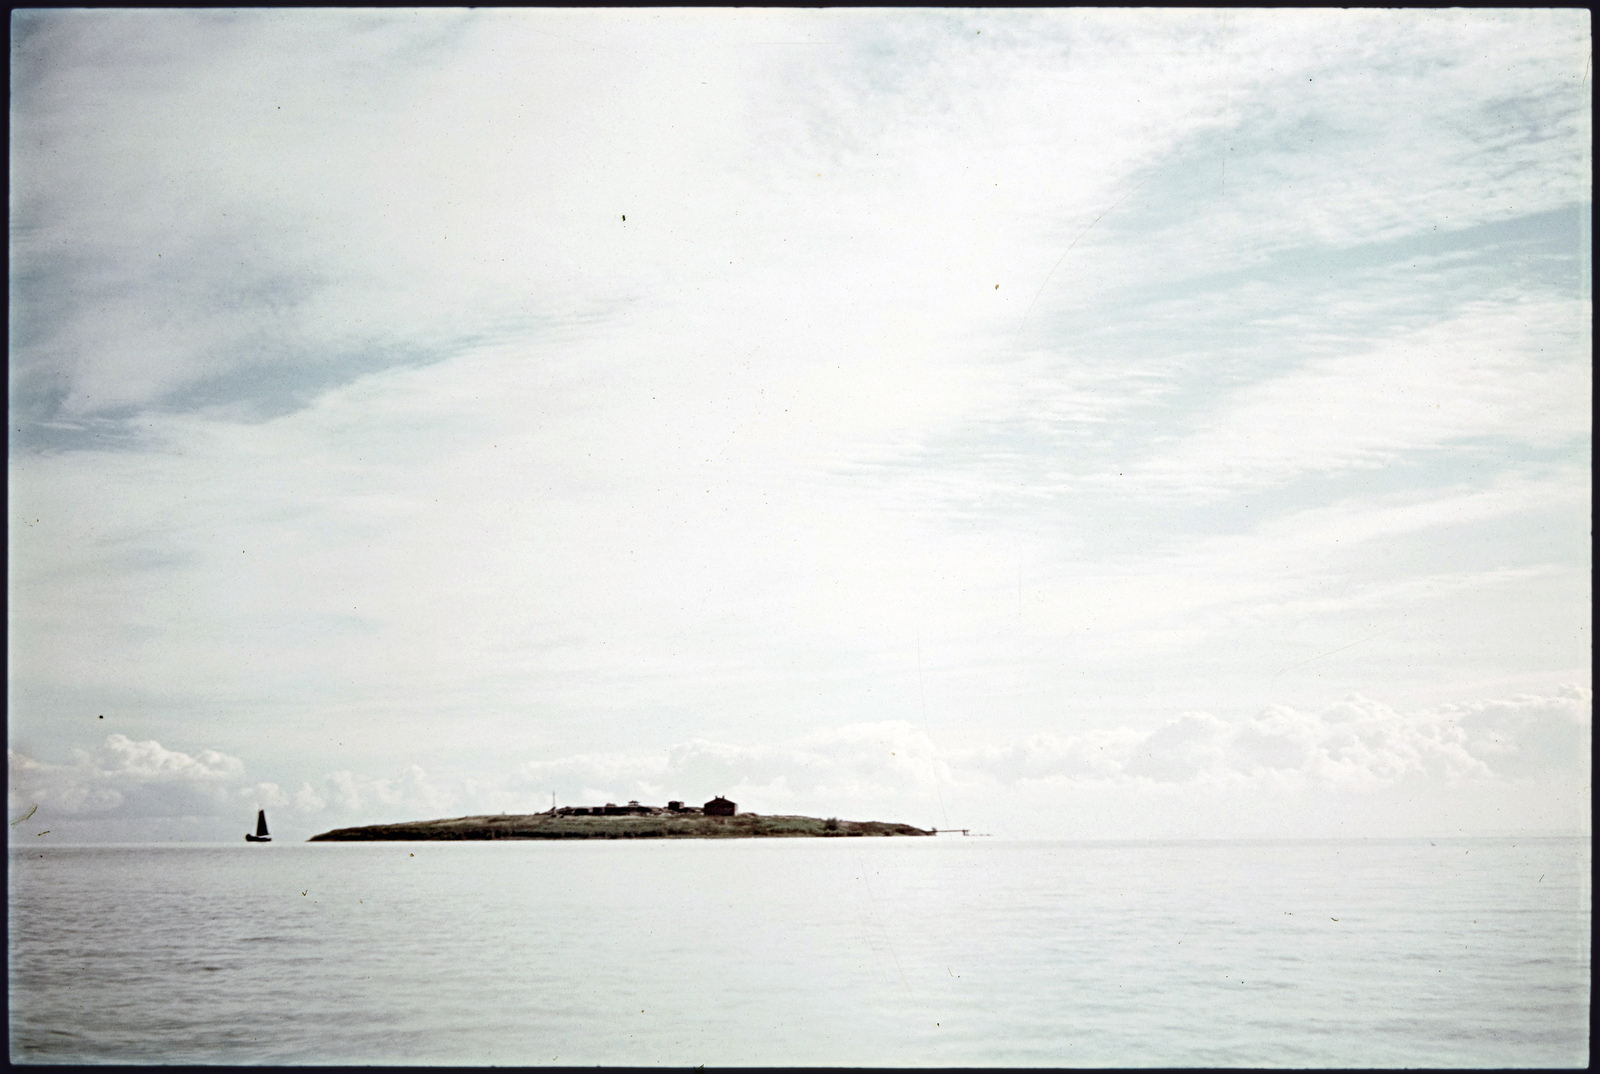 Het eiland Pampus